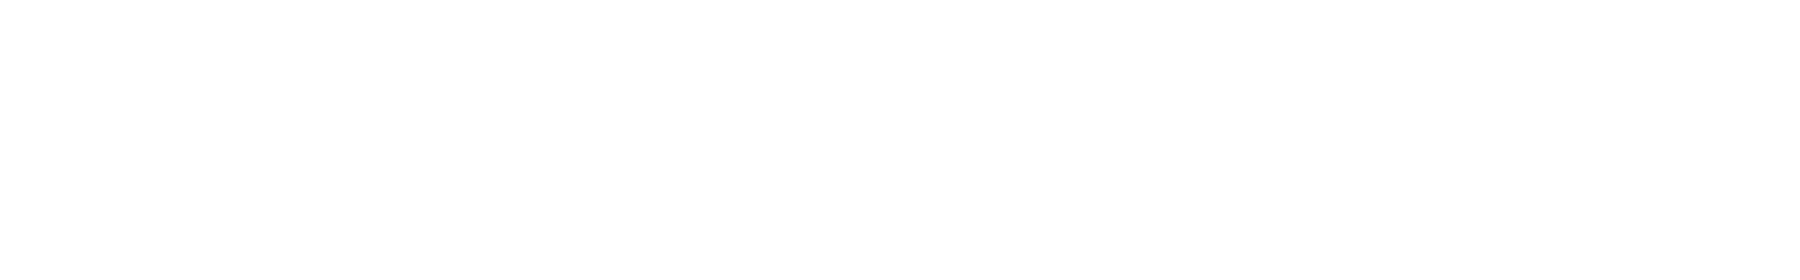 vedh synth cut 182 am